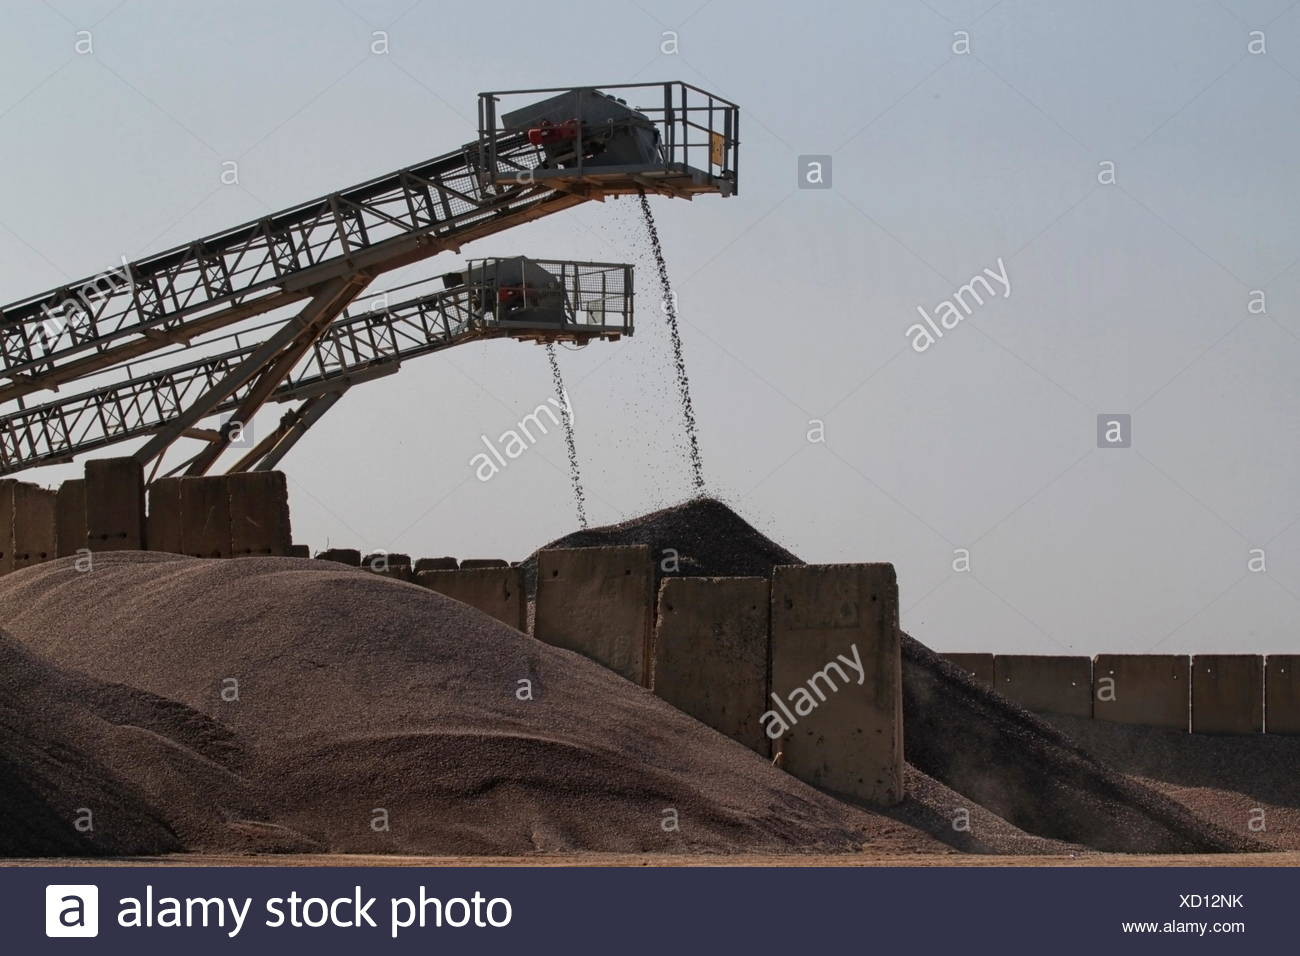 conveyor belt,degradation,gravel pit - Stock Image